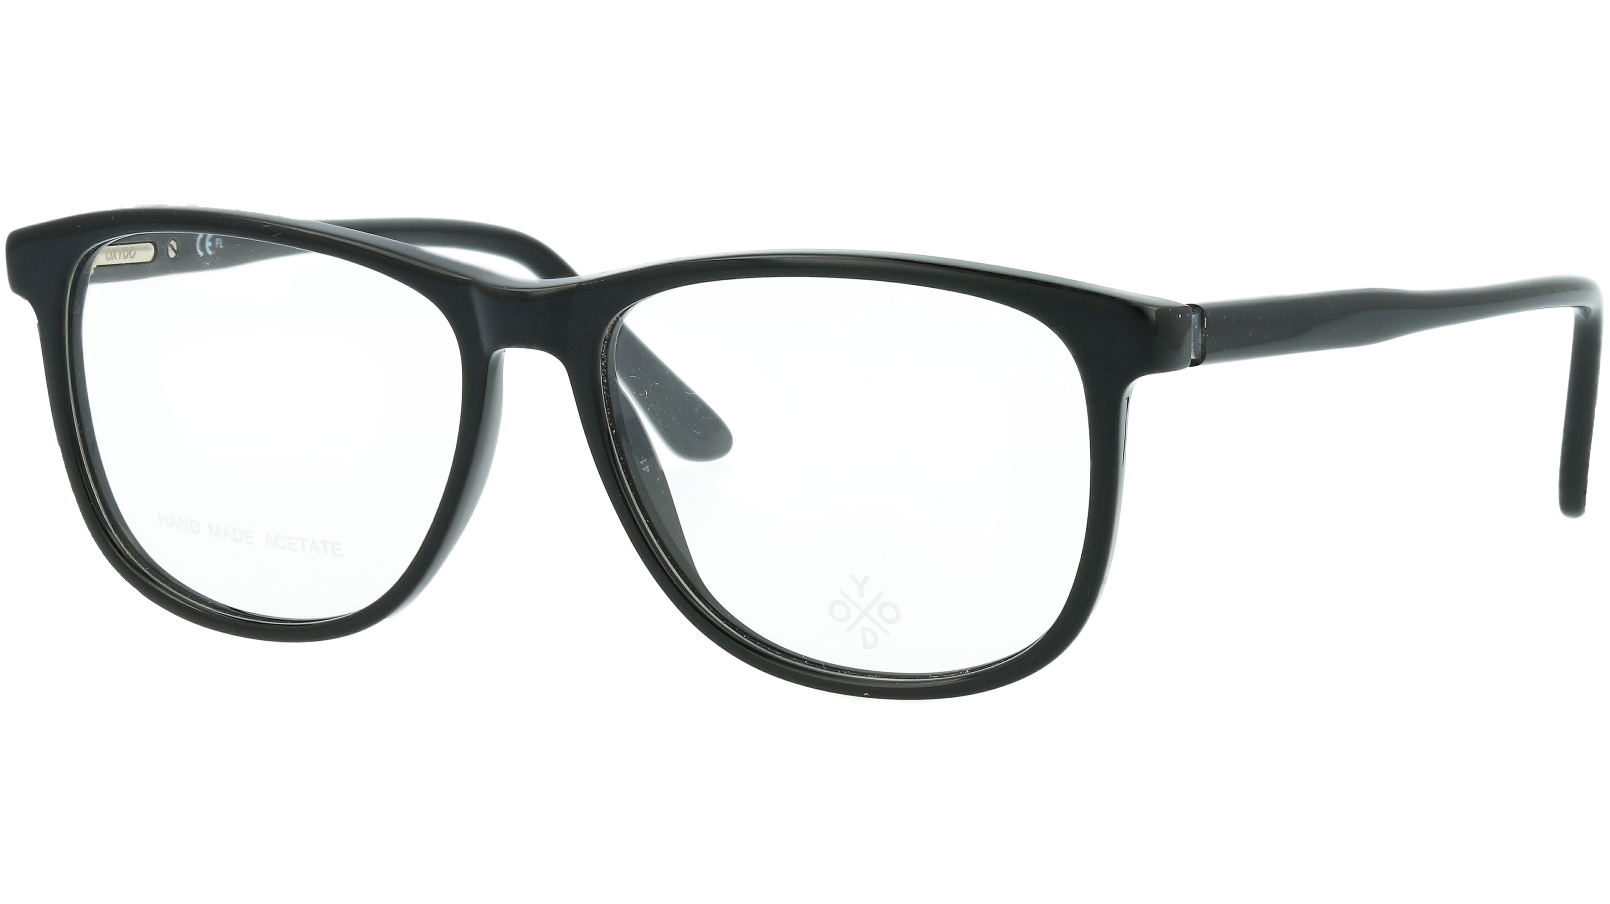 Oxydo OX539 807 53 Black Glasses